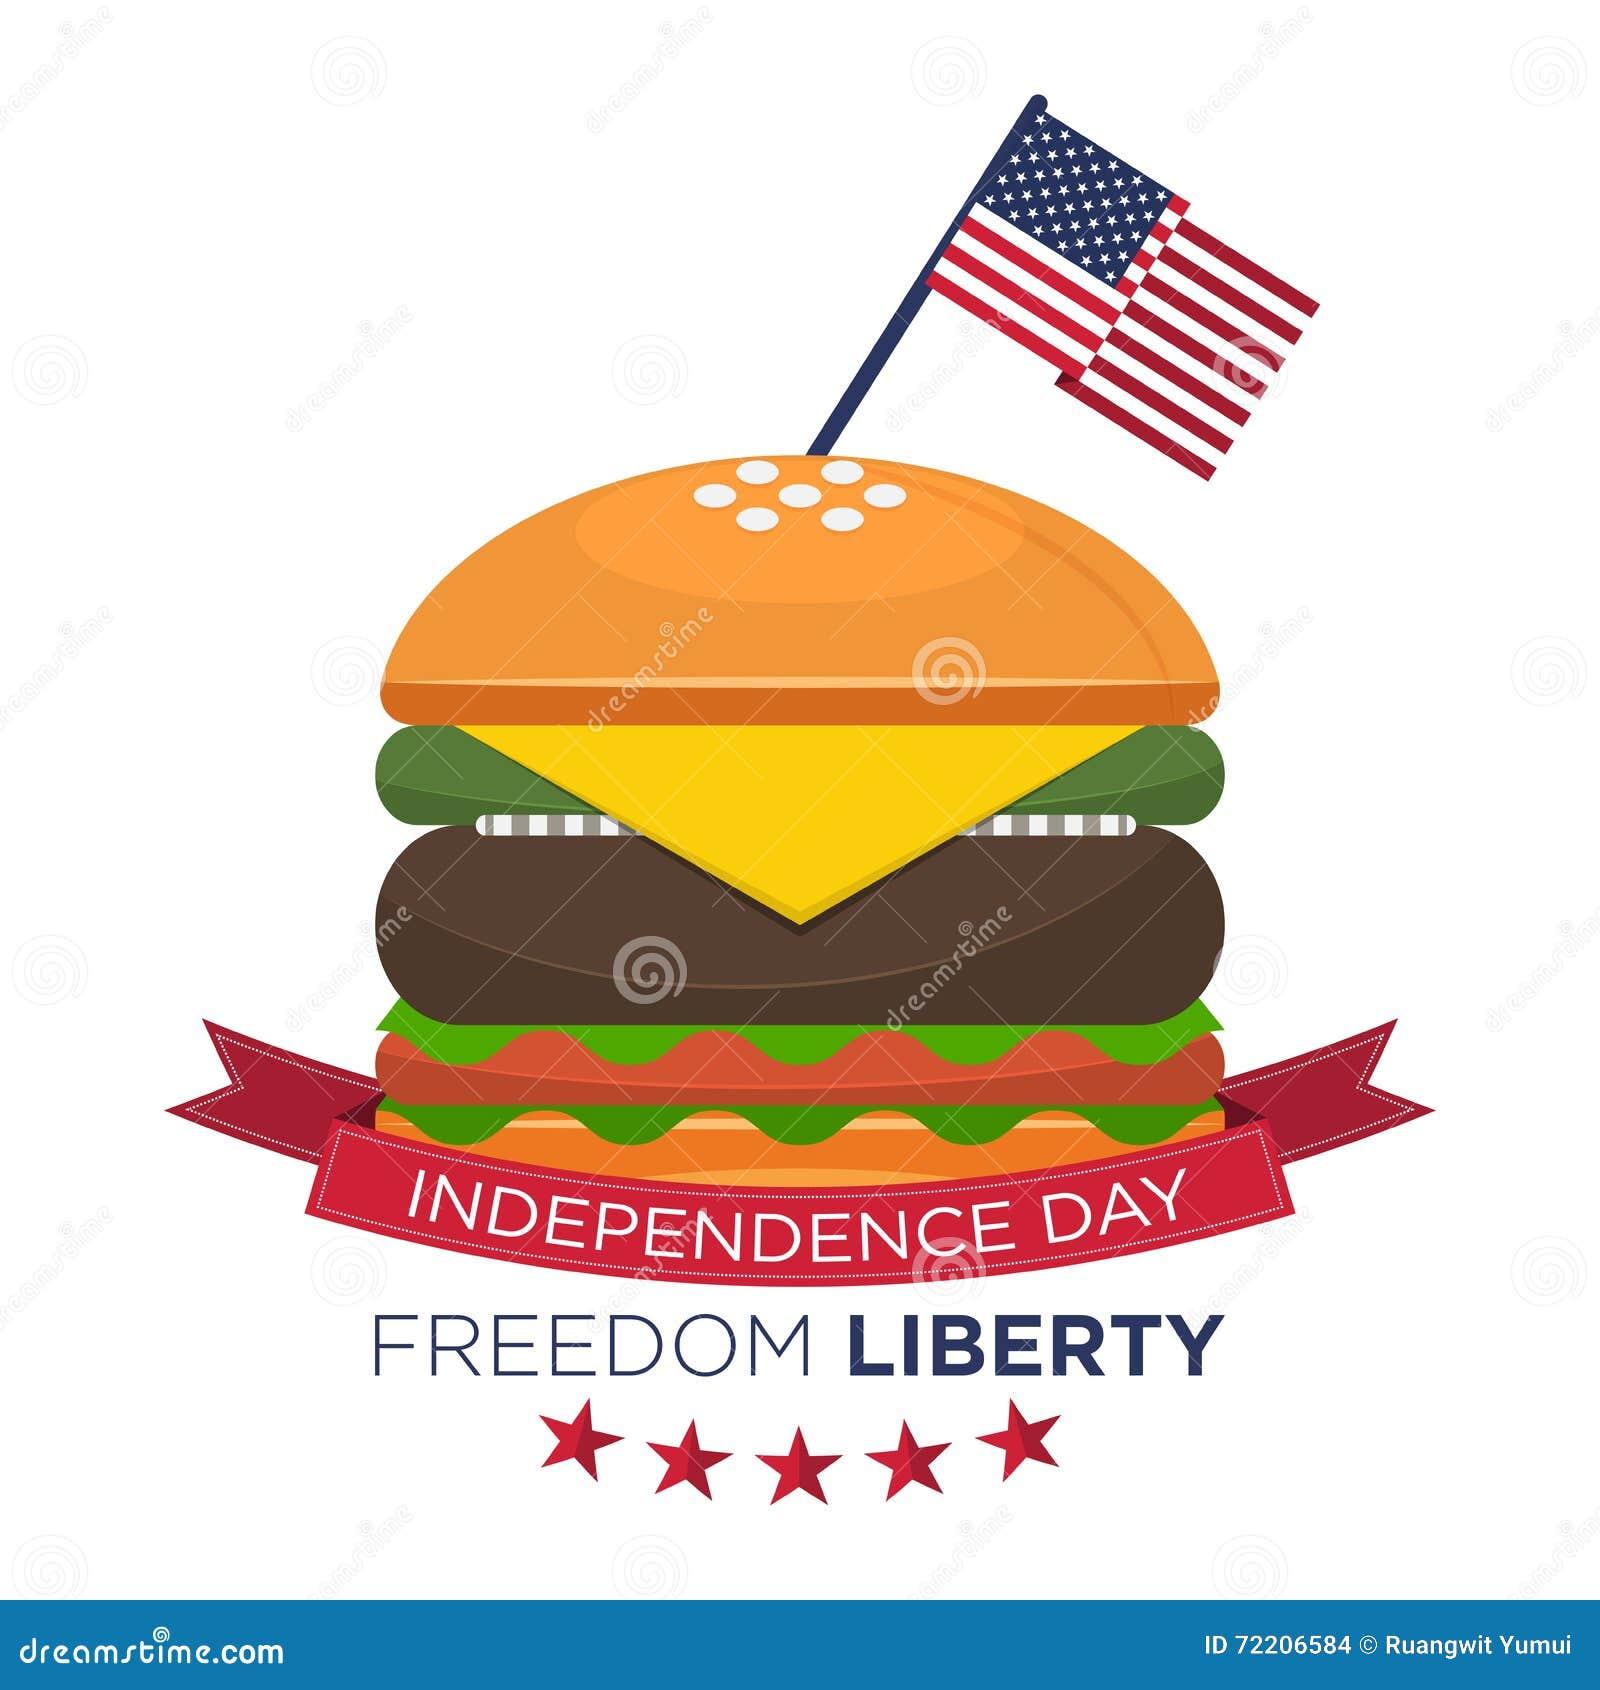 hamburger united states essay Three essays michael hamburger editions  for hardcover/paperback orders in  united states, canada, latin america, asia, and australia.